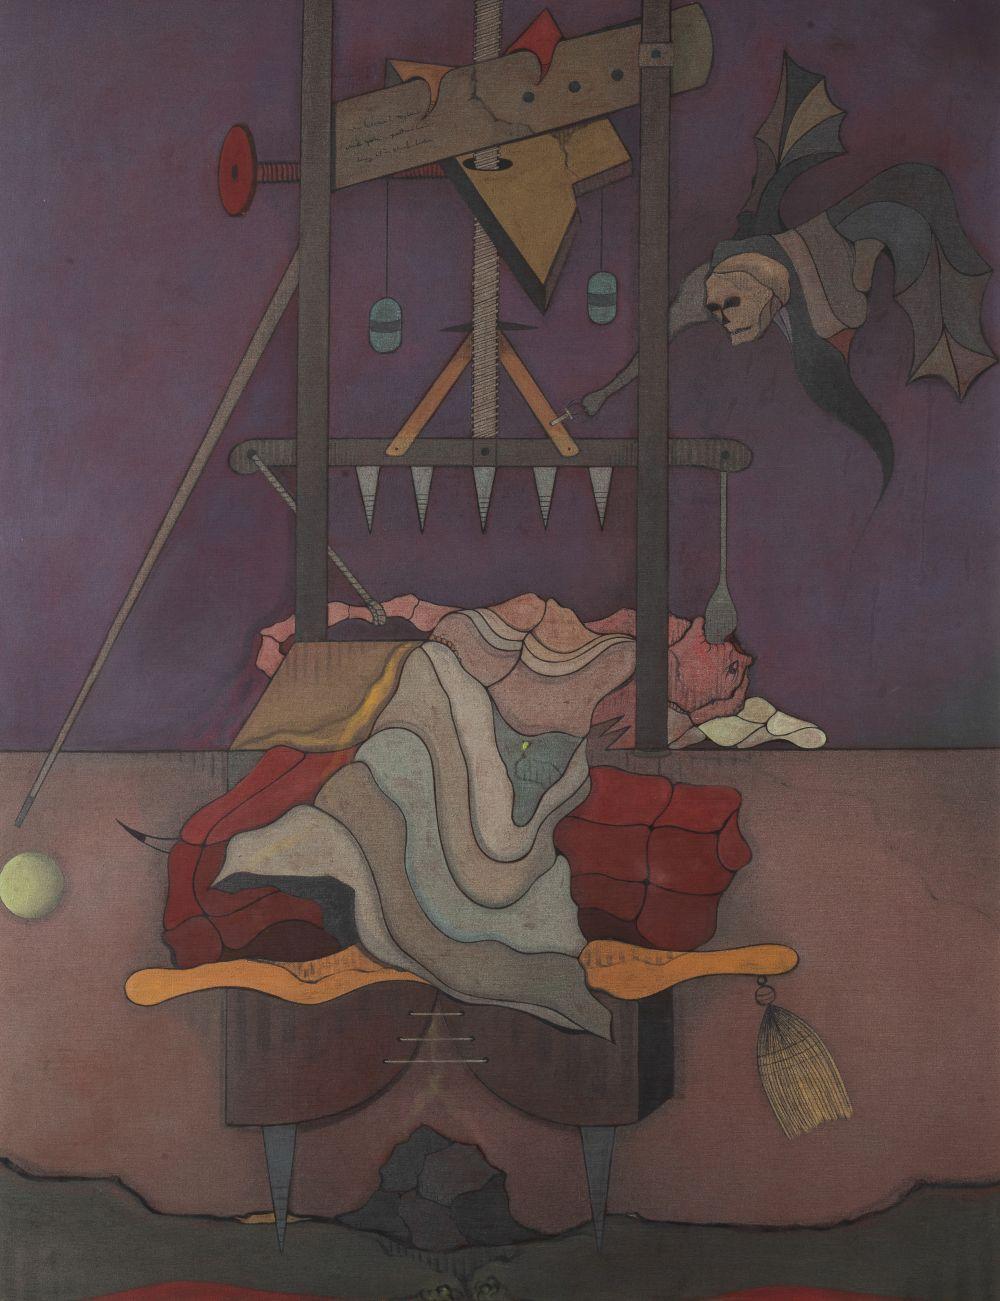 Jorge Camacho - Homage to Raymond Roussel, 1970